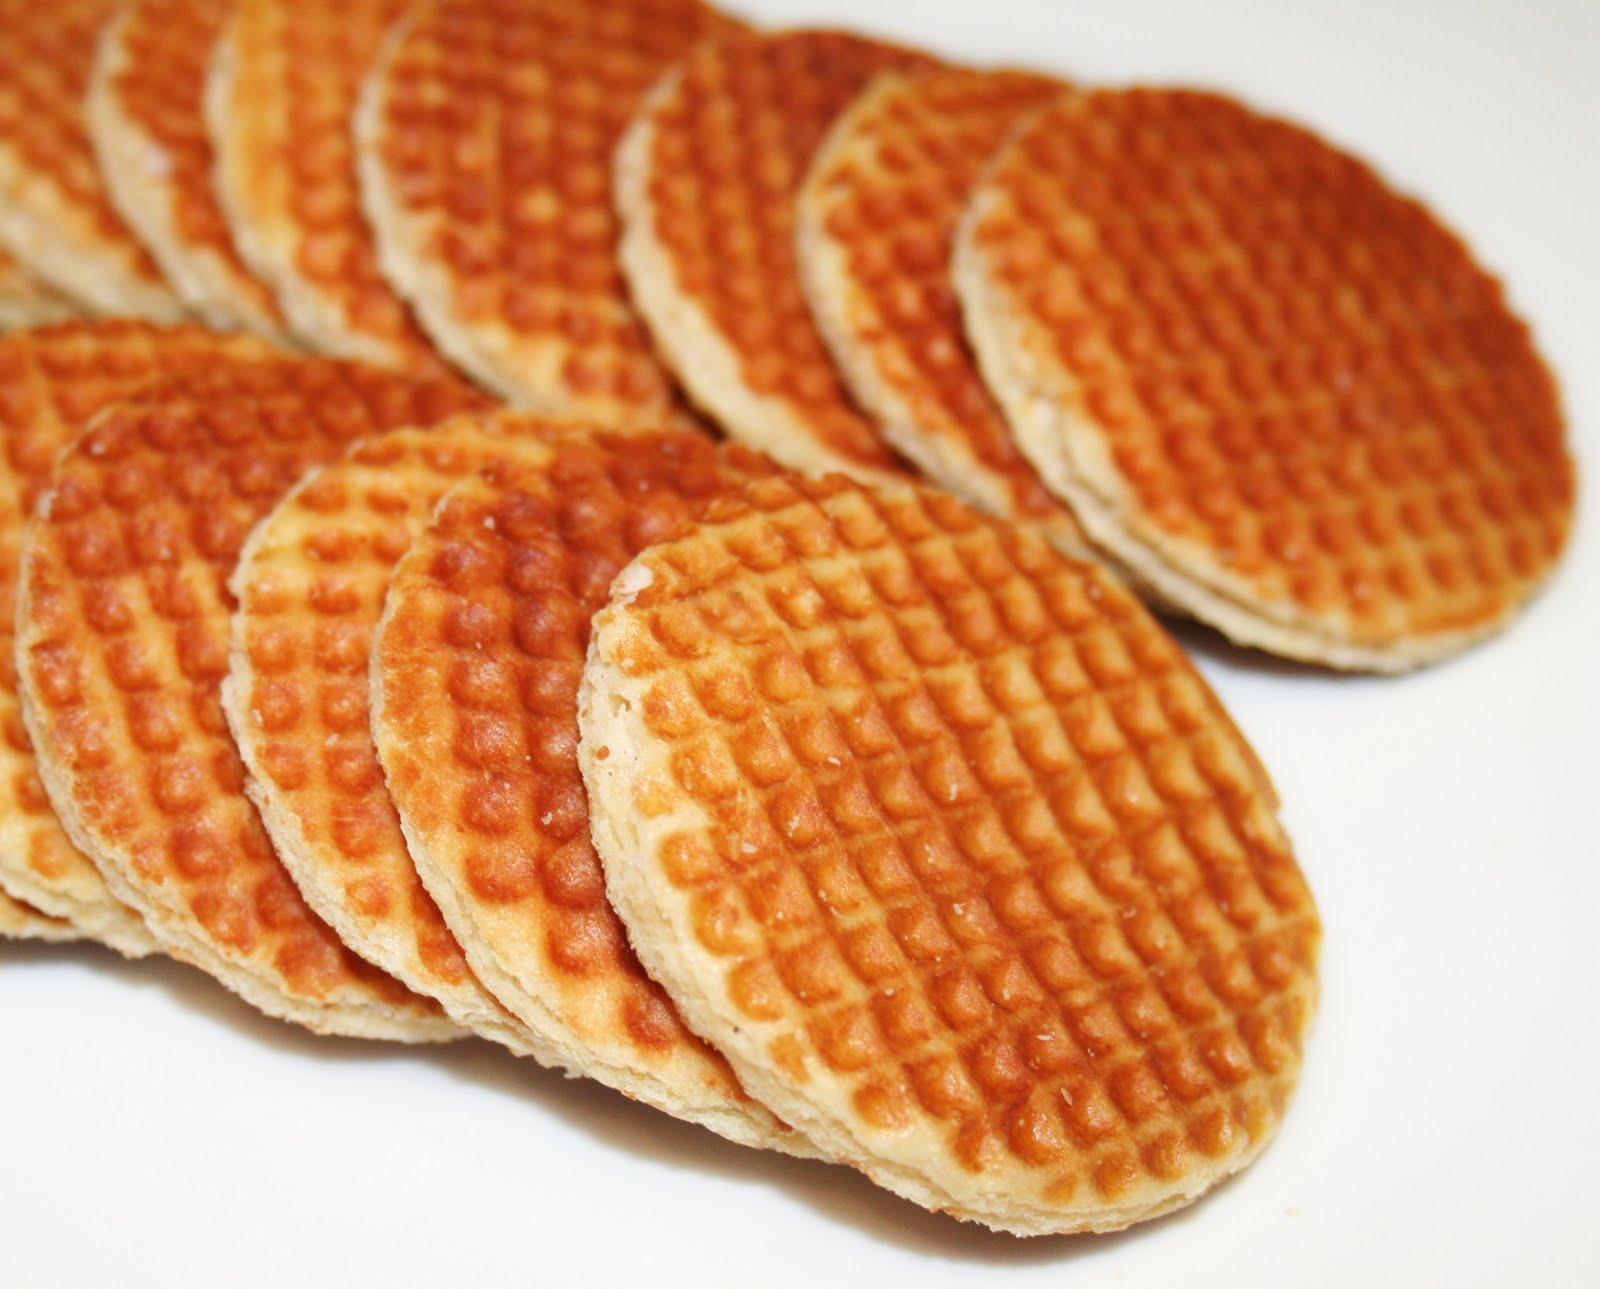 la cuisine de bernard : gaufres flamandes à la vanille